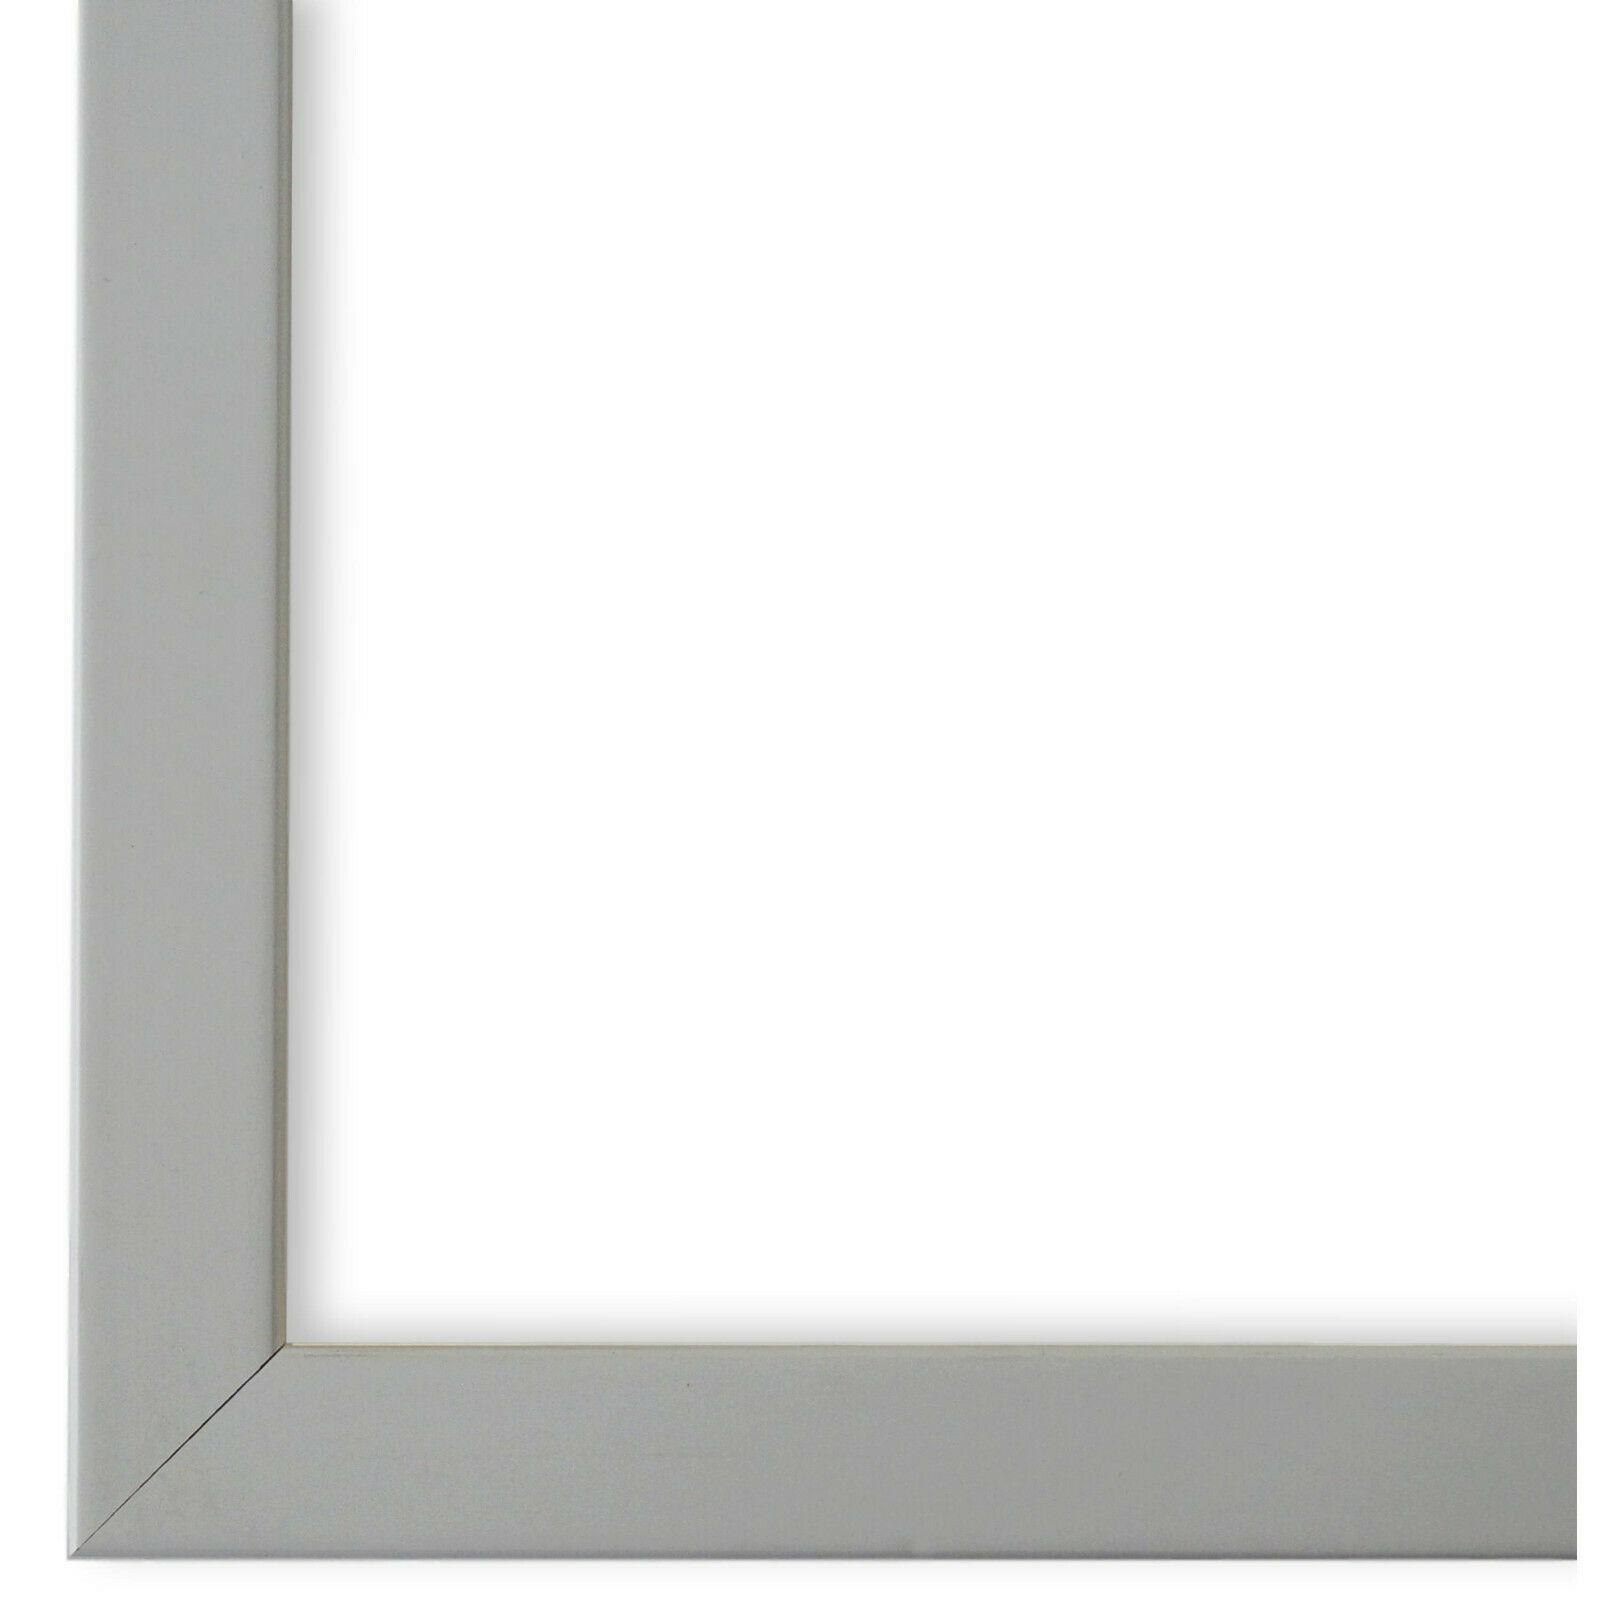 Bilderrahmen Weiss Holz Asti 1,7-10x15 13x18 15x20 18x24 20x20 20x30